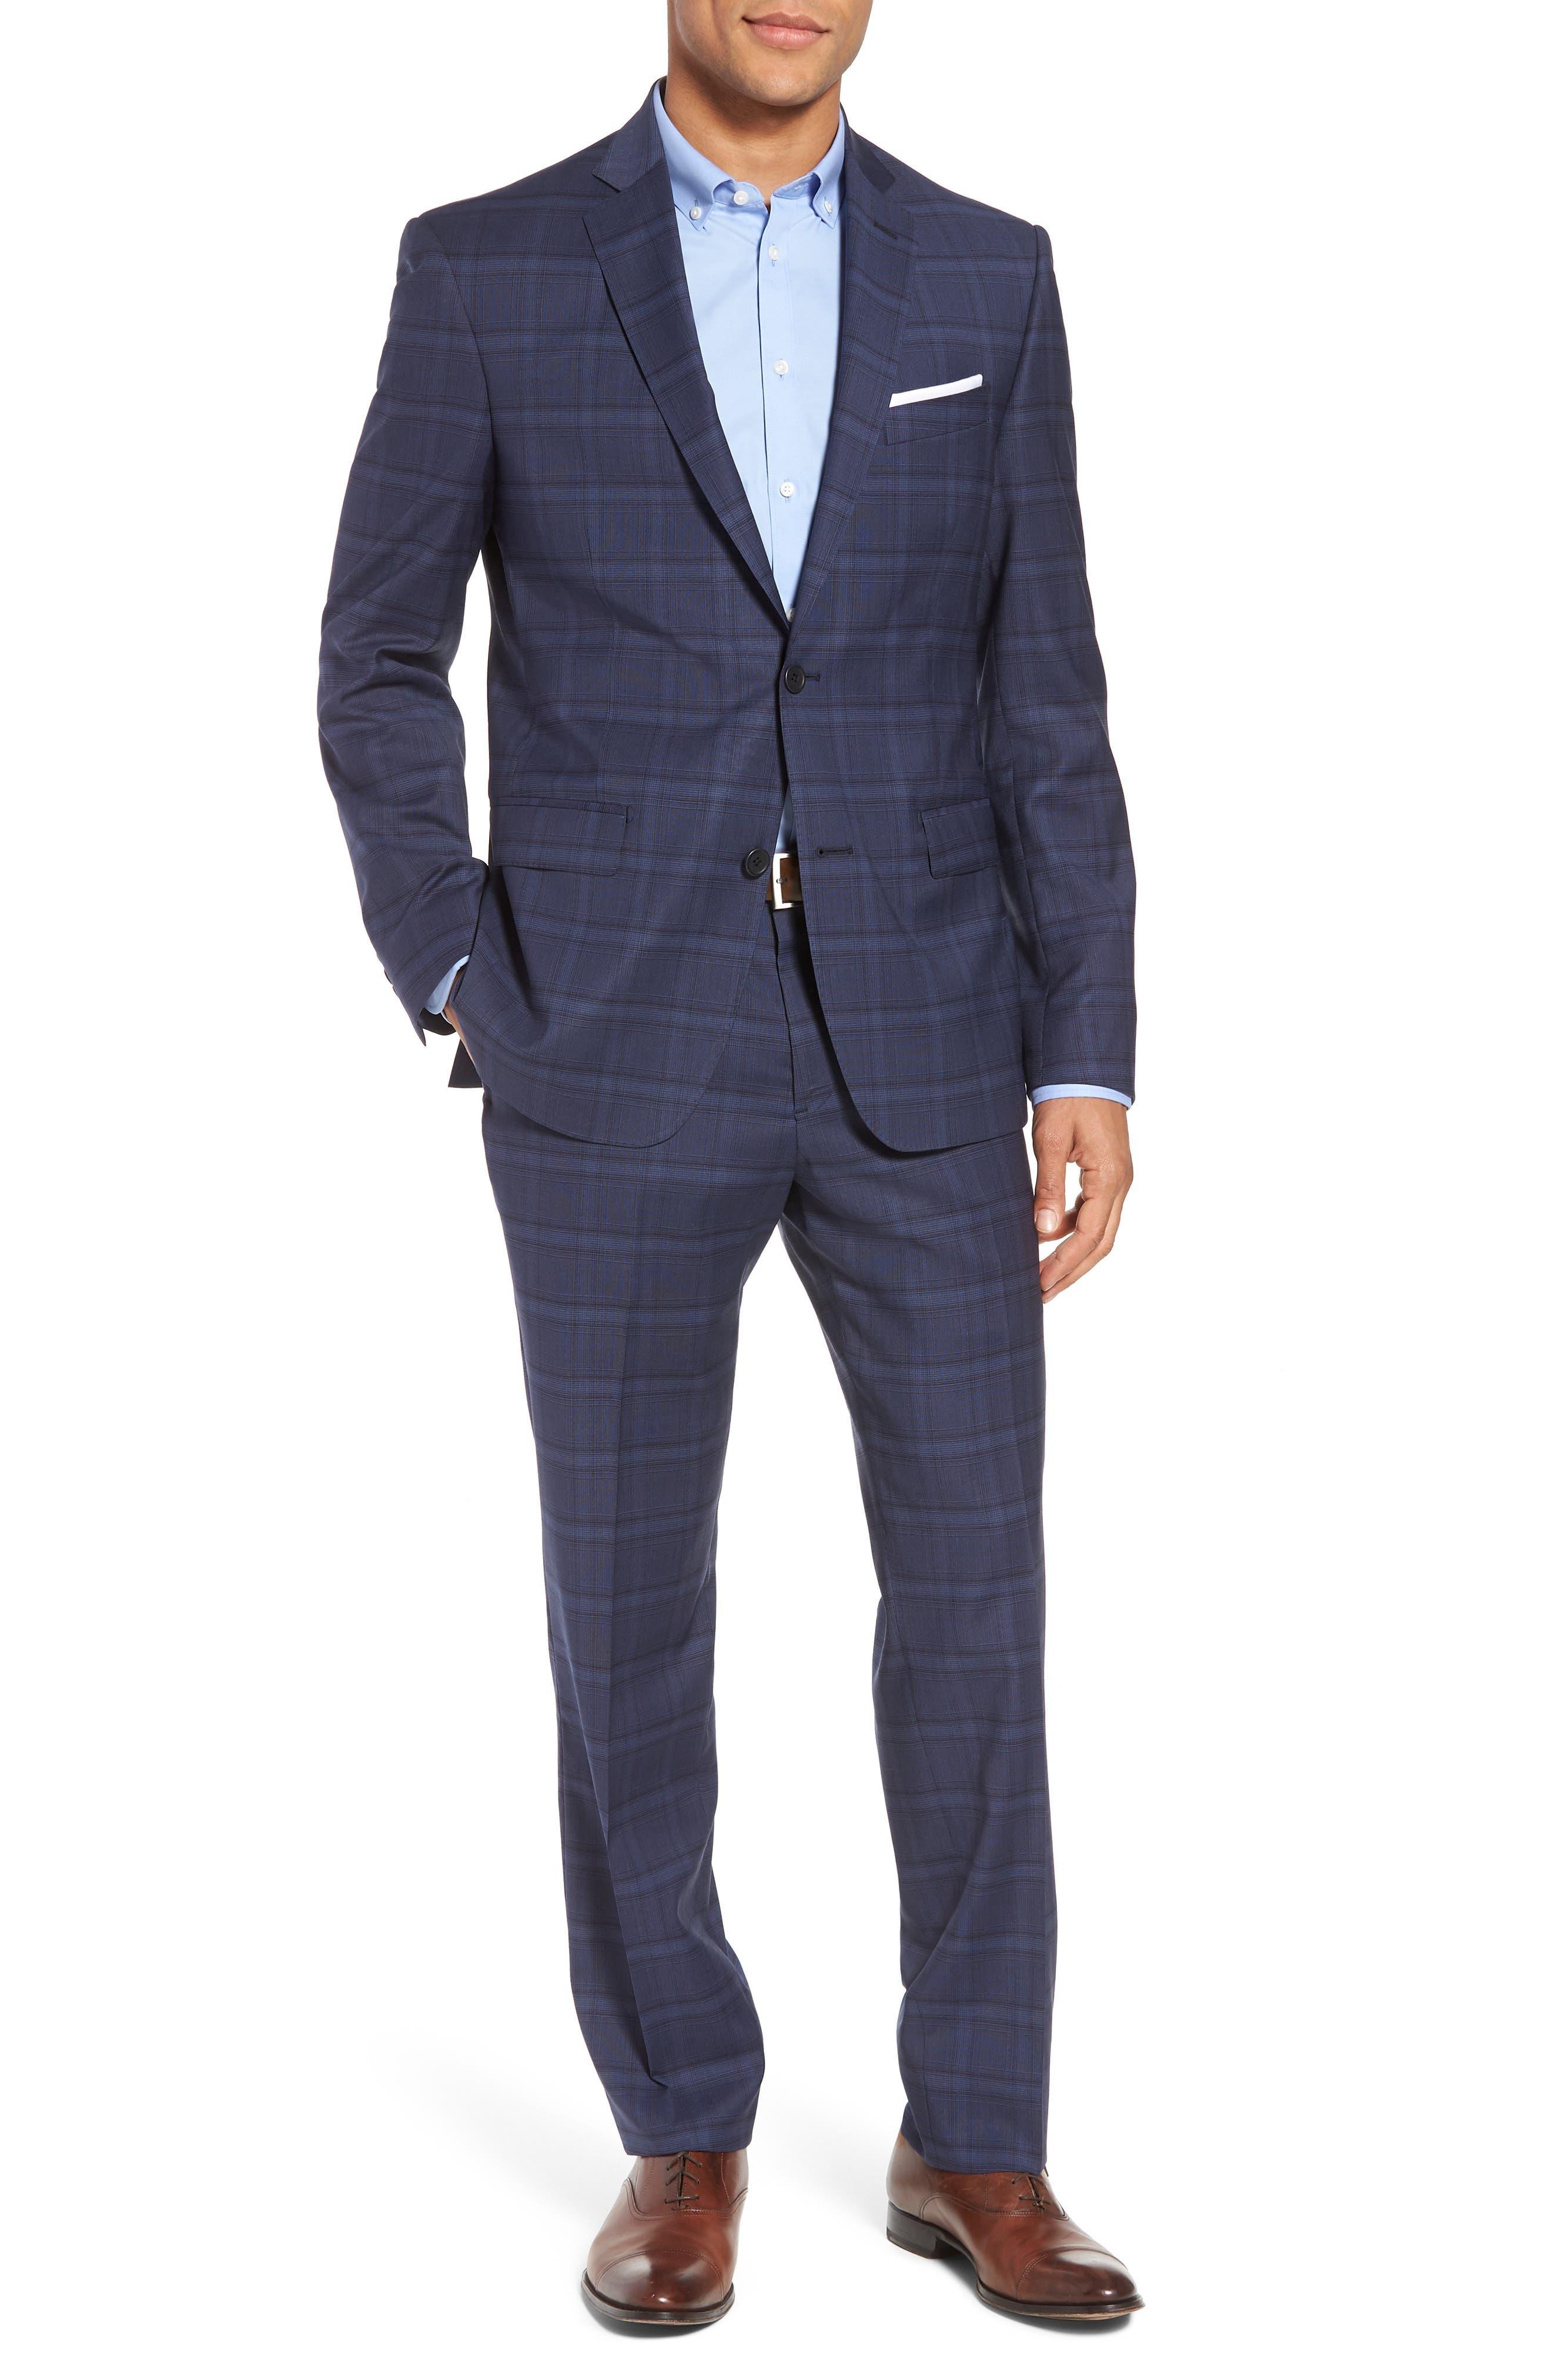 Alternate Image 1 Selected - Nordstrom Men's Shop Trim Fit Plaid Stretch Wool Travel Suit